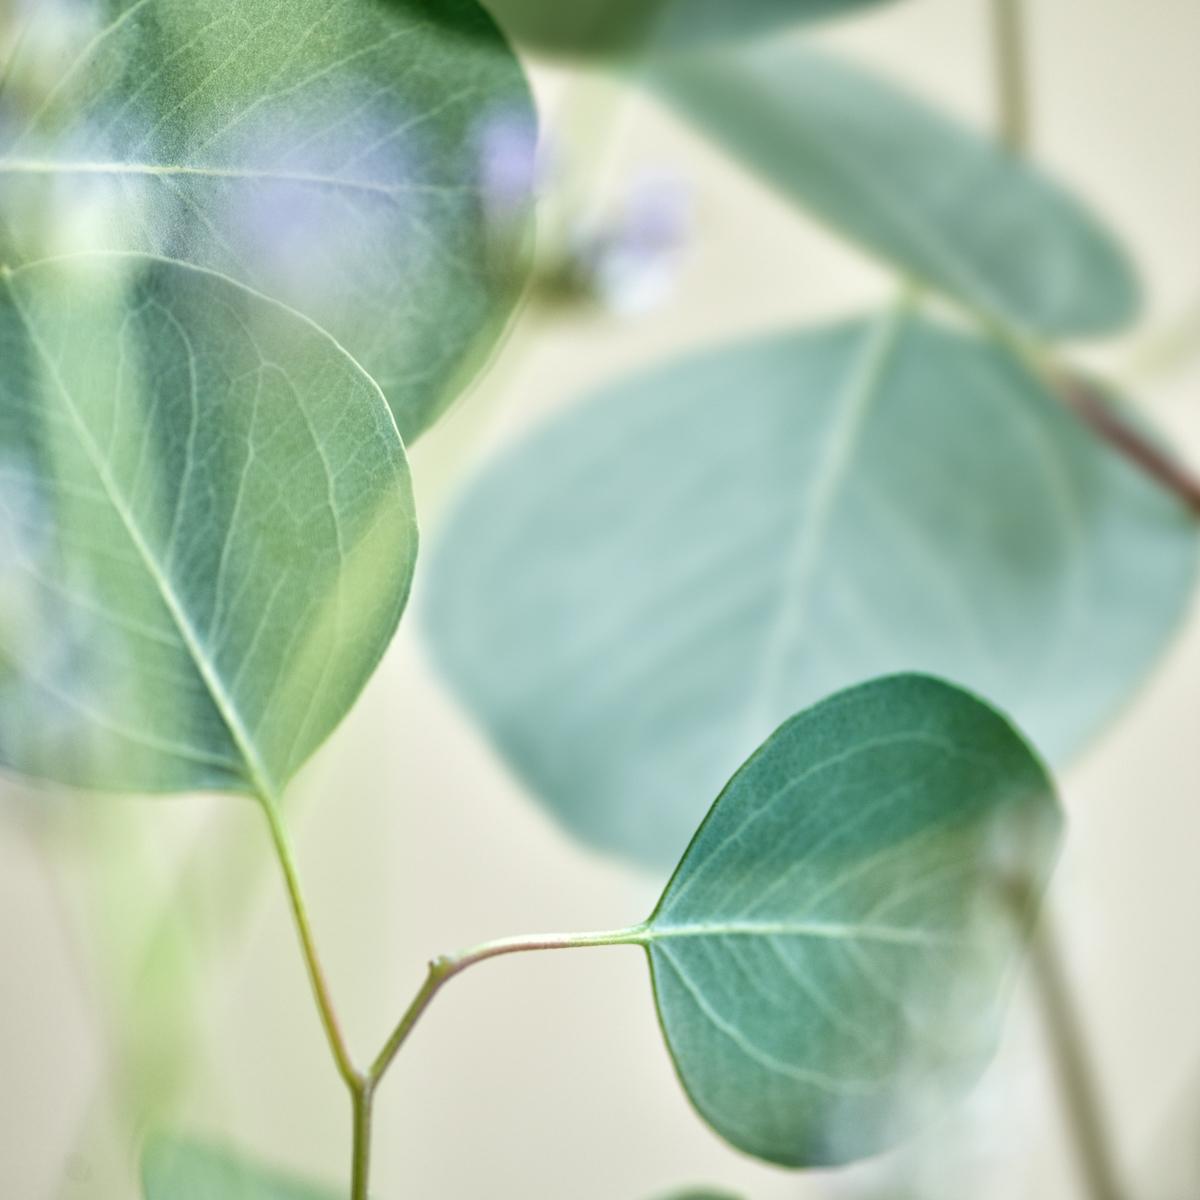 Eucalyptus Leaves II (large view)